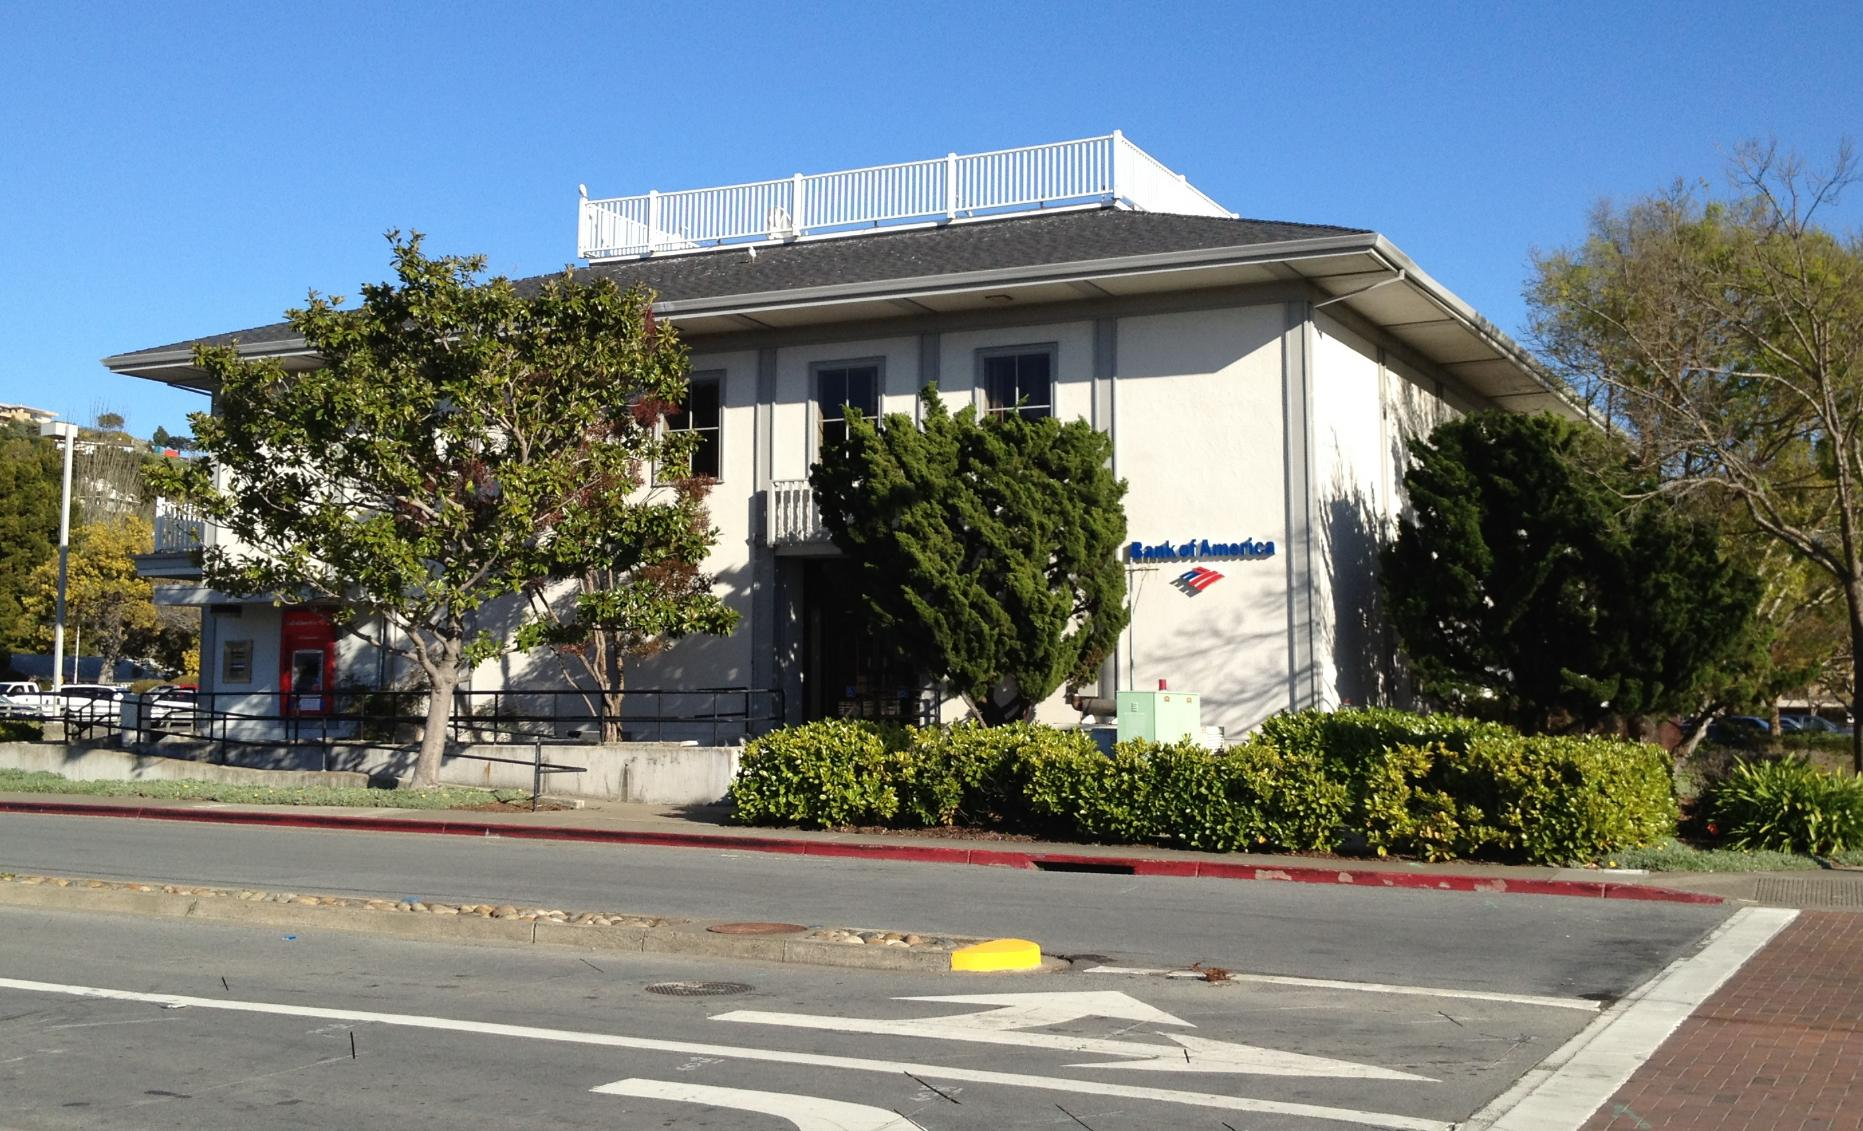 1601 Tiburon Boulevard, Tiburon, CA 94920 5,026 SF STNL Bank of America $5,850,000